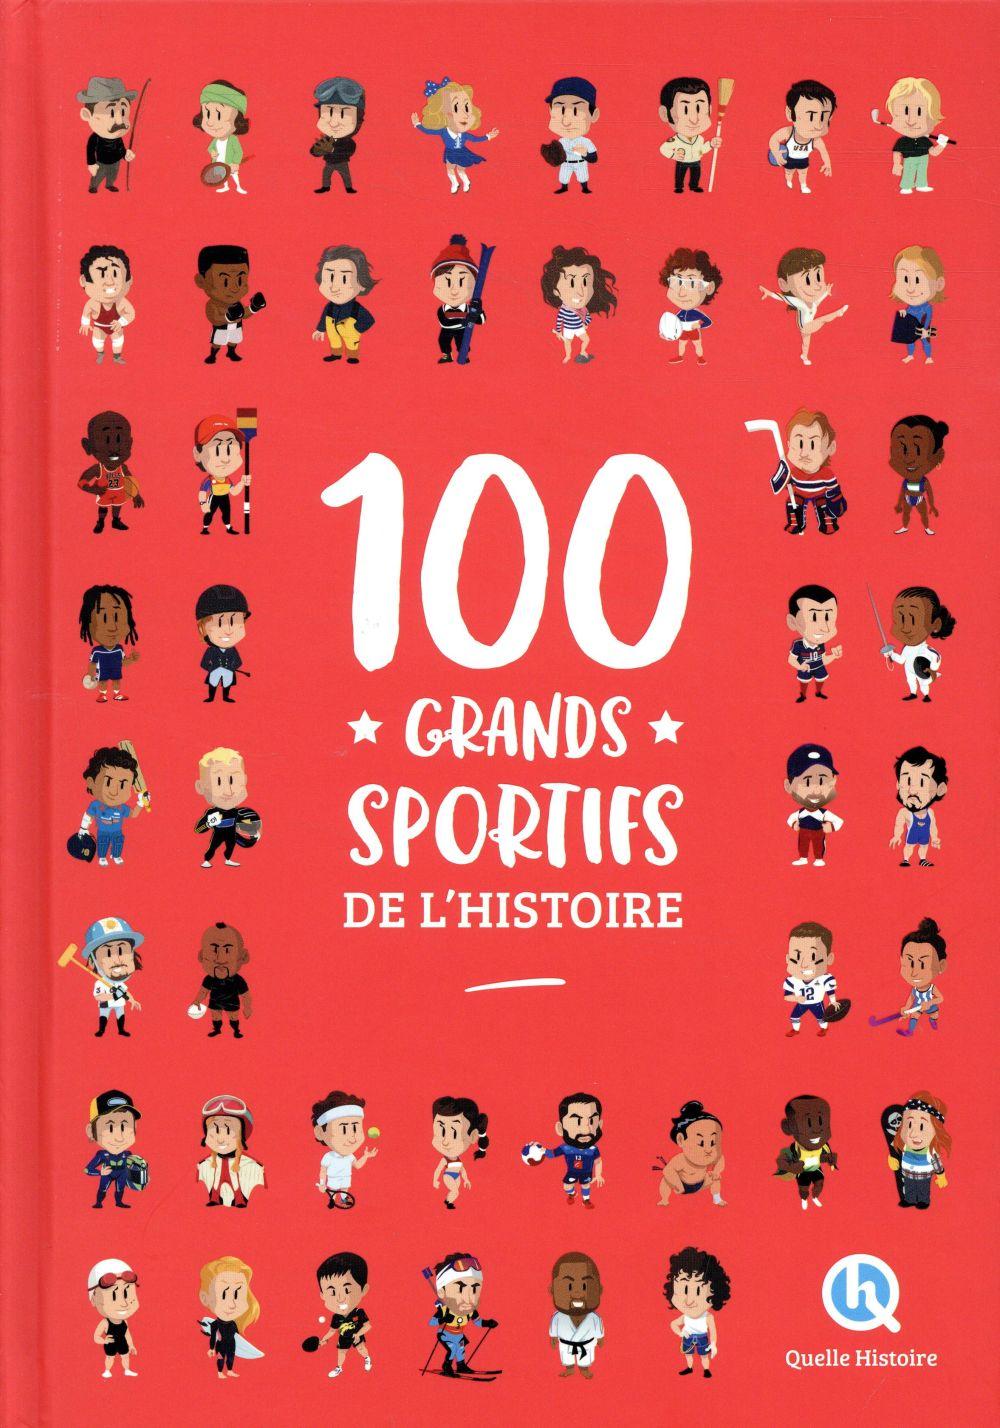 100 GRANDS SPORTIFS DE L'HISTOIRE